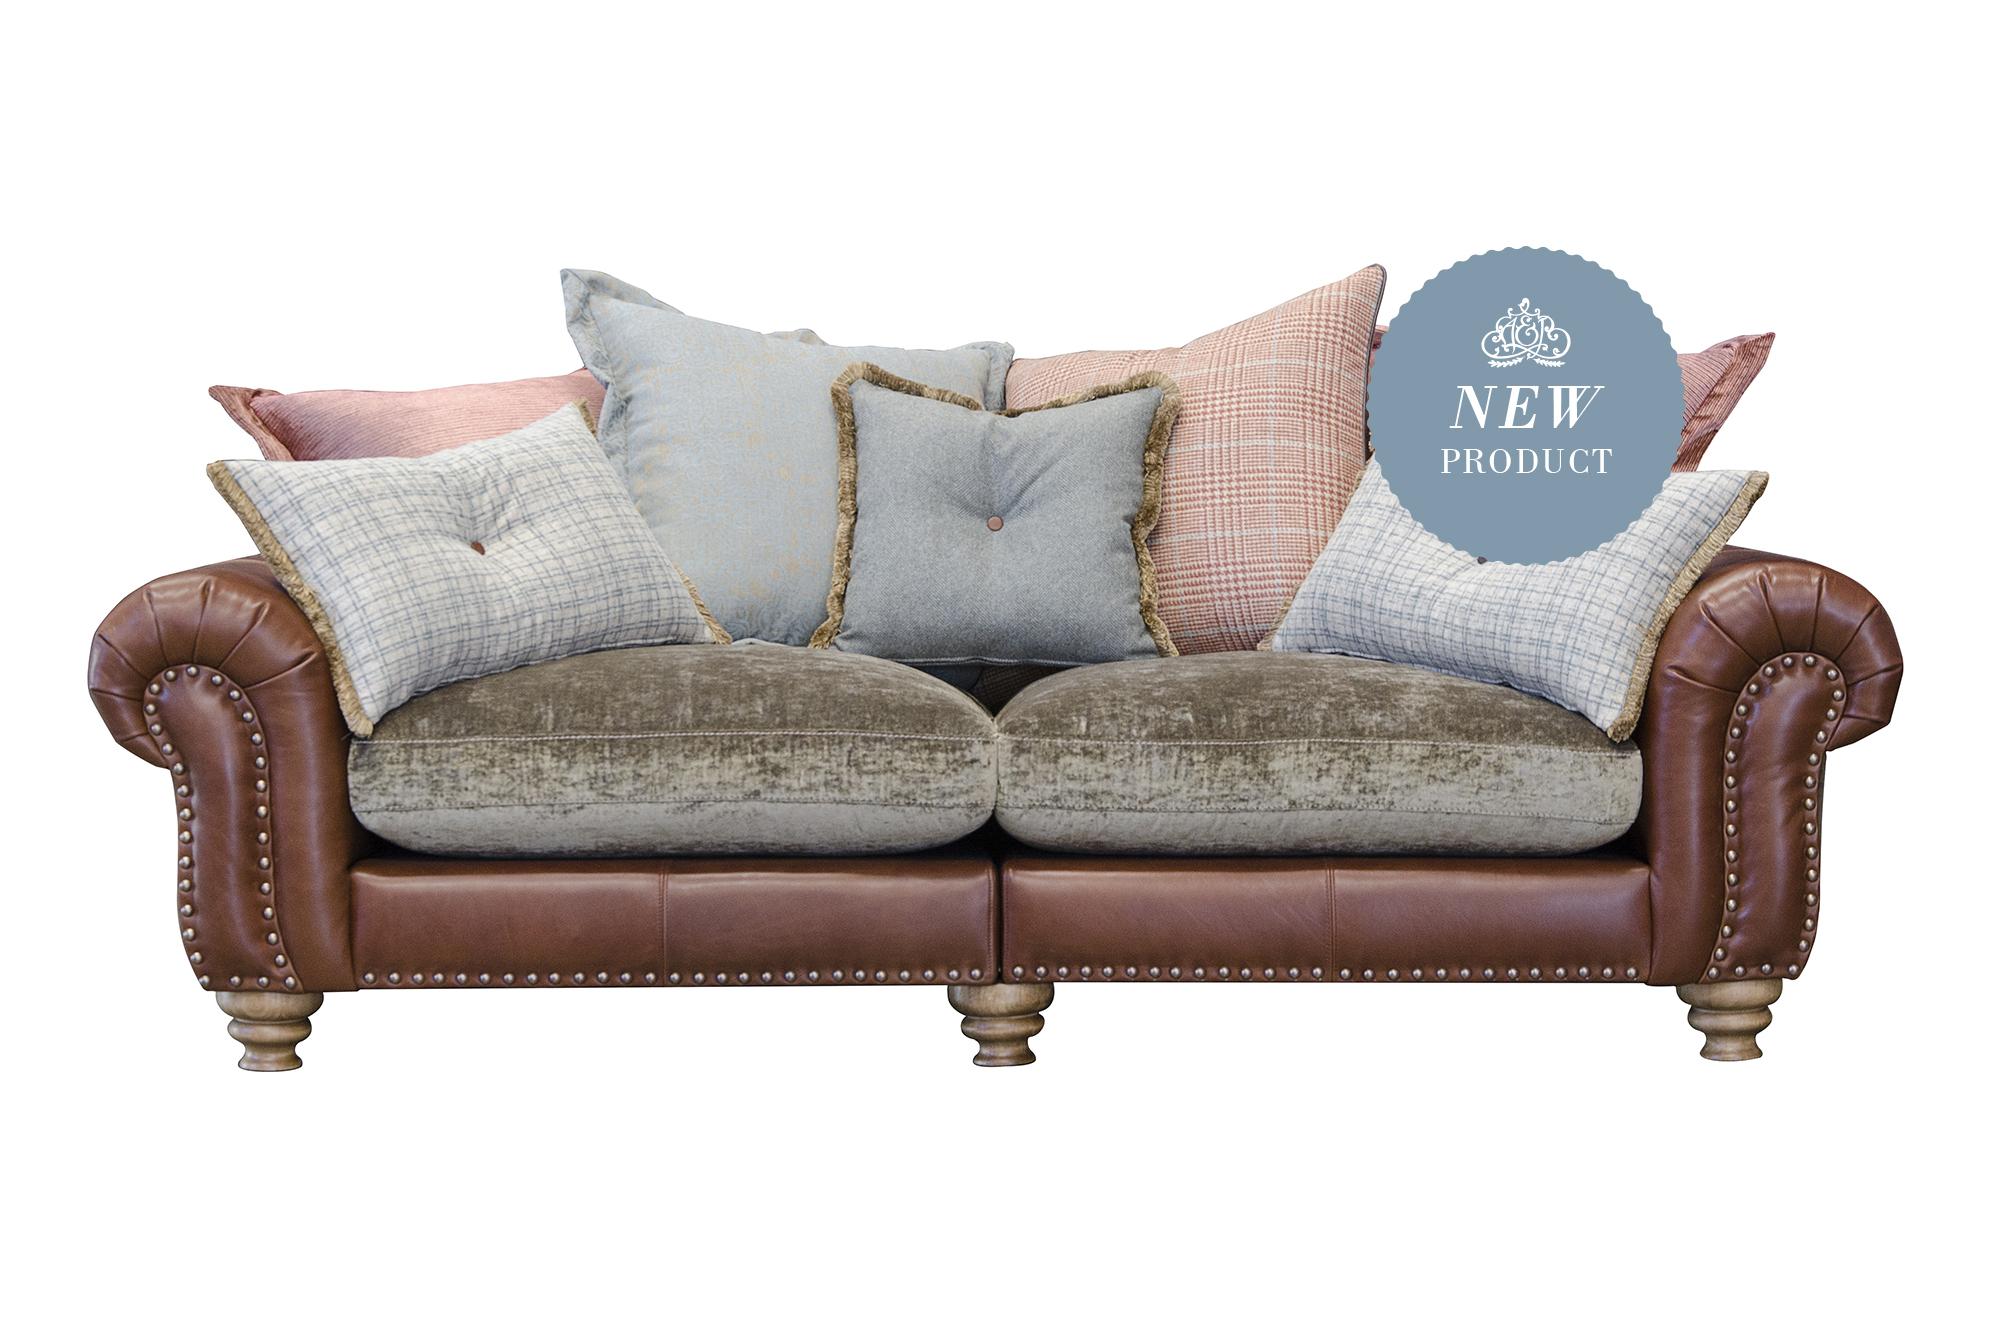 Alexander & James Bloomsbury Large Sofa